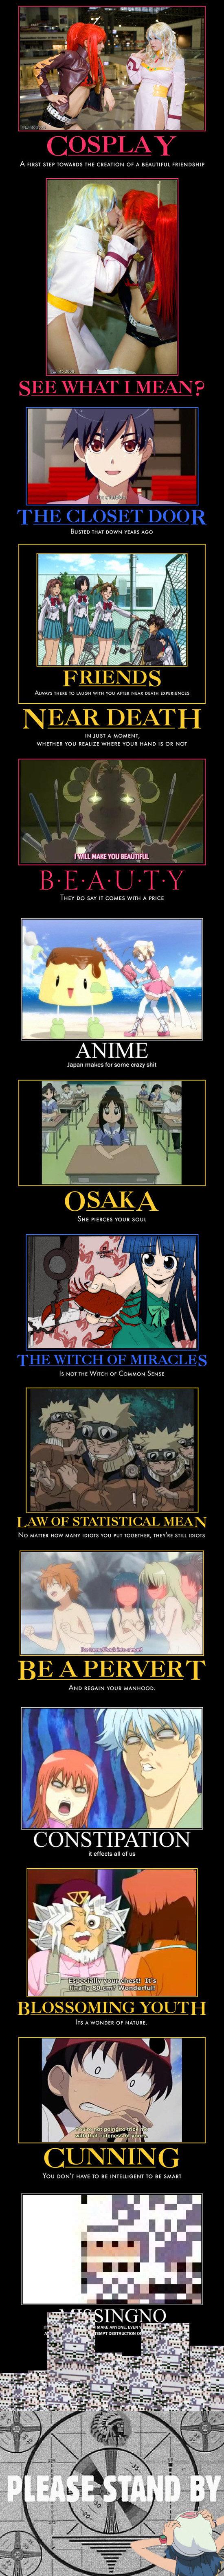 Anime Mot Posters 619. Found and Compiled, not Made 1,2 - Tengen Toppa Gurren Lagann 4 -Full Metal Panic 8 - Higurashi 9 - Naruto 10 - toLoveru 11 - Gintama 12  Anime mot posters